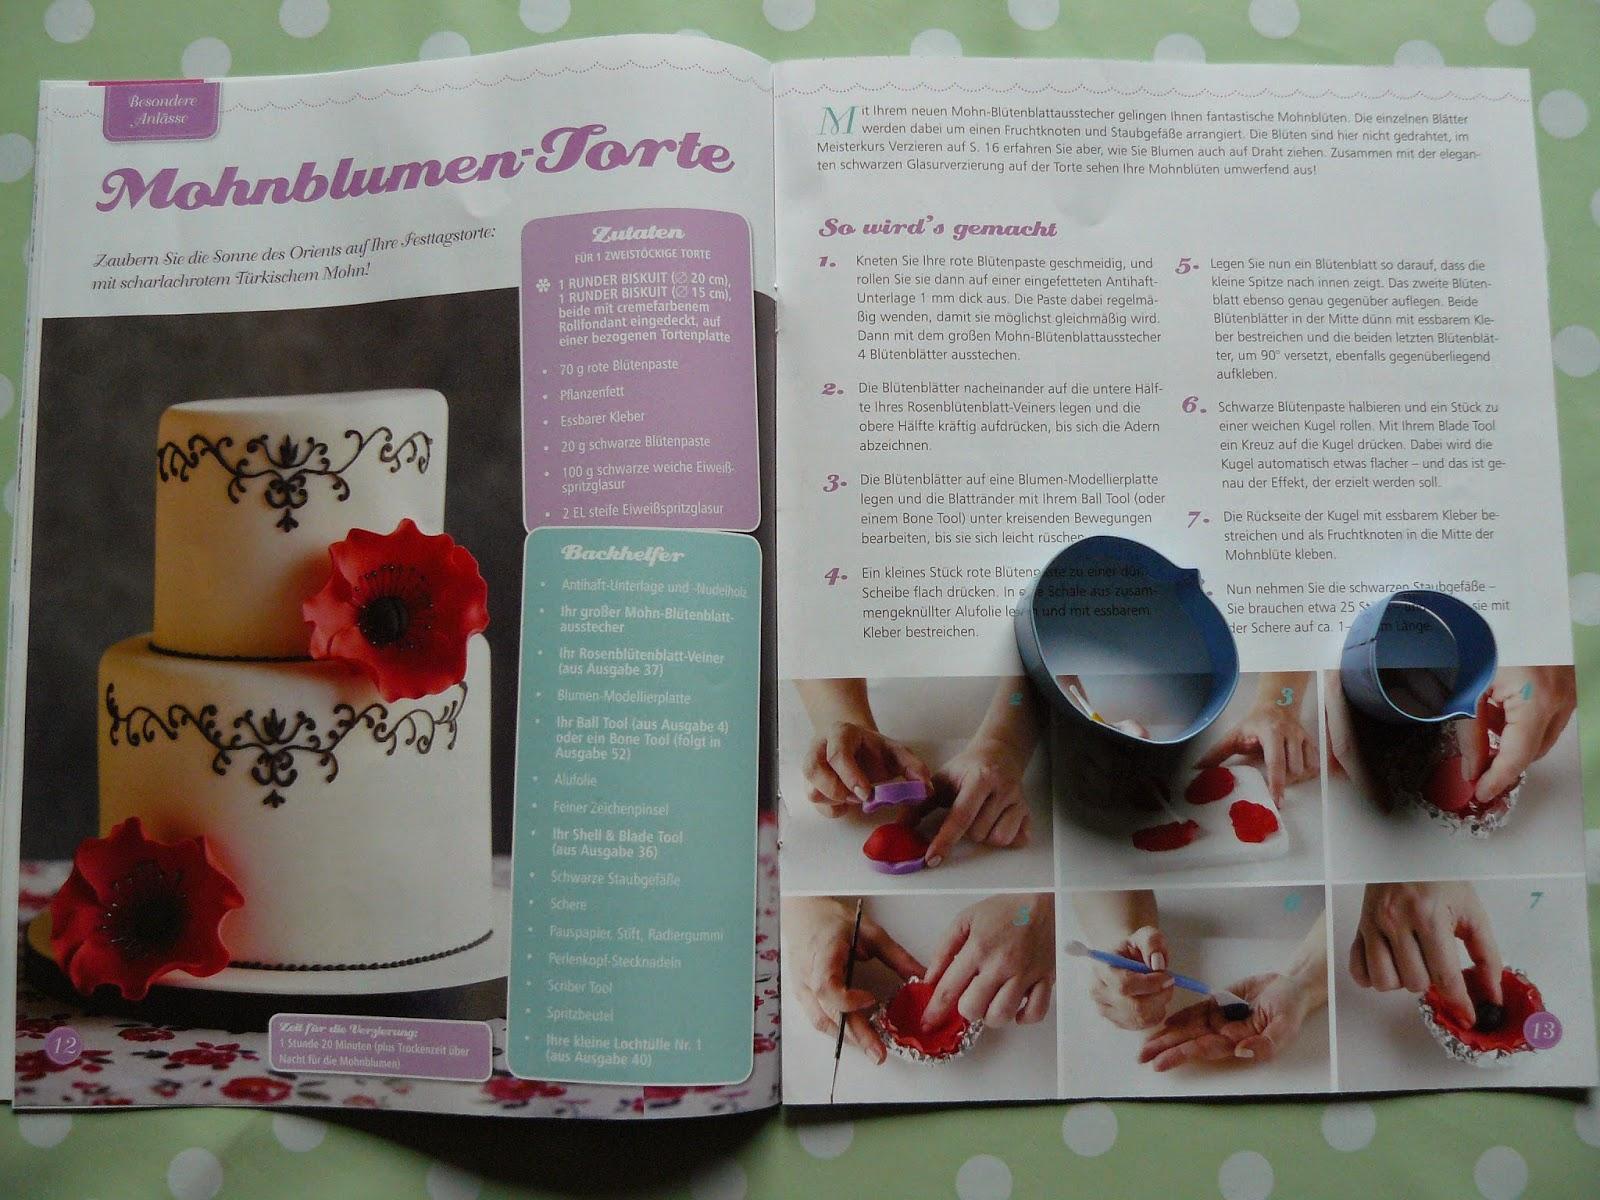 Torten Dekorieren Zeitschrift jule backt rezension zeitschrift torten dekorieren und